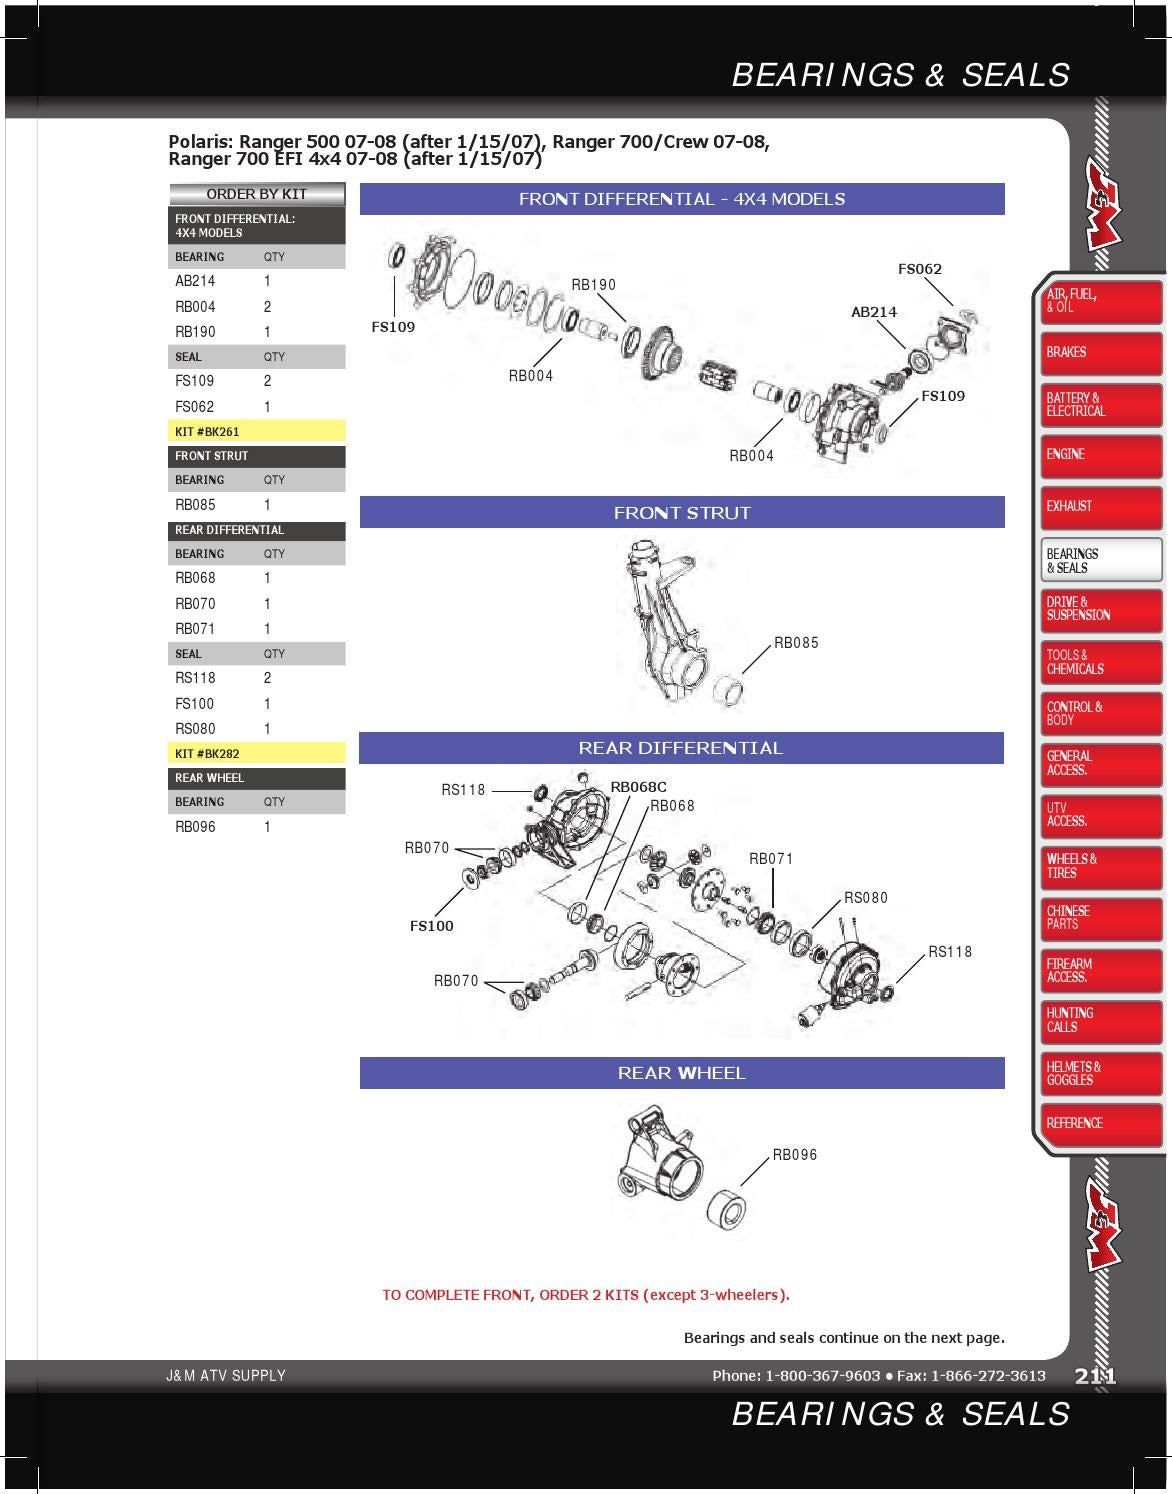 Polaris Ranger 700 4x4 ATV Rear Wheel Bearings 07-08